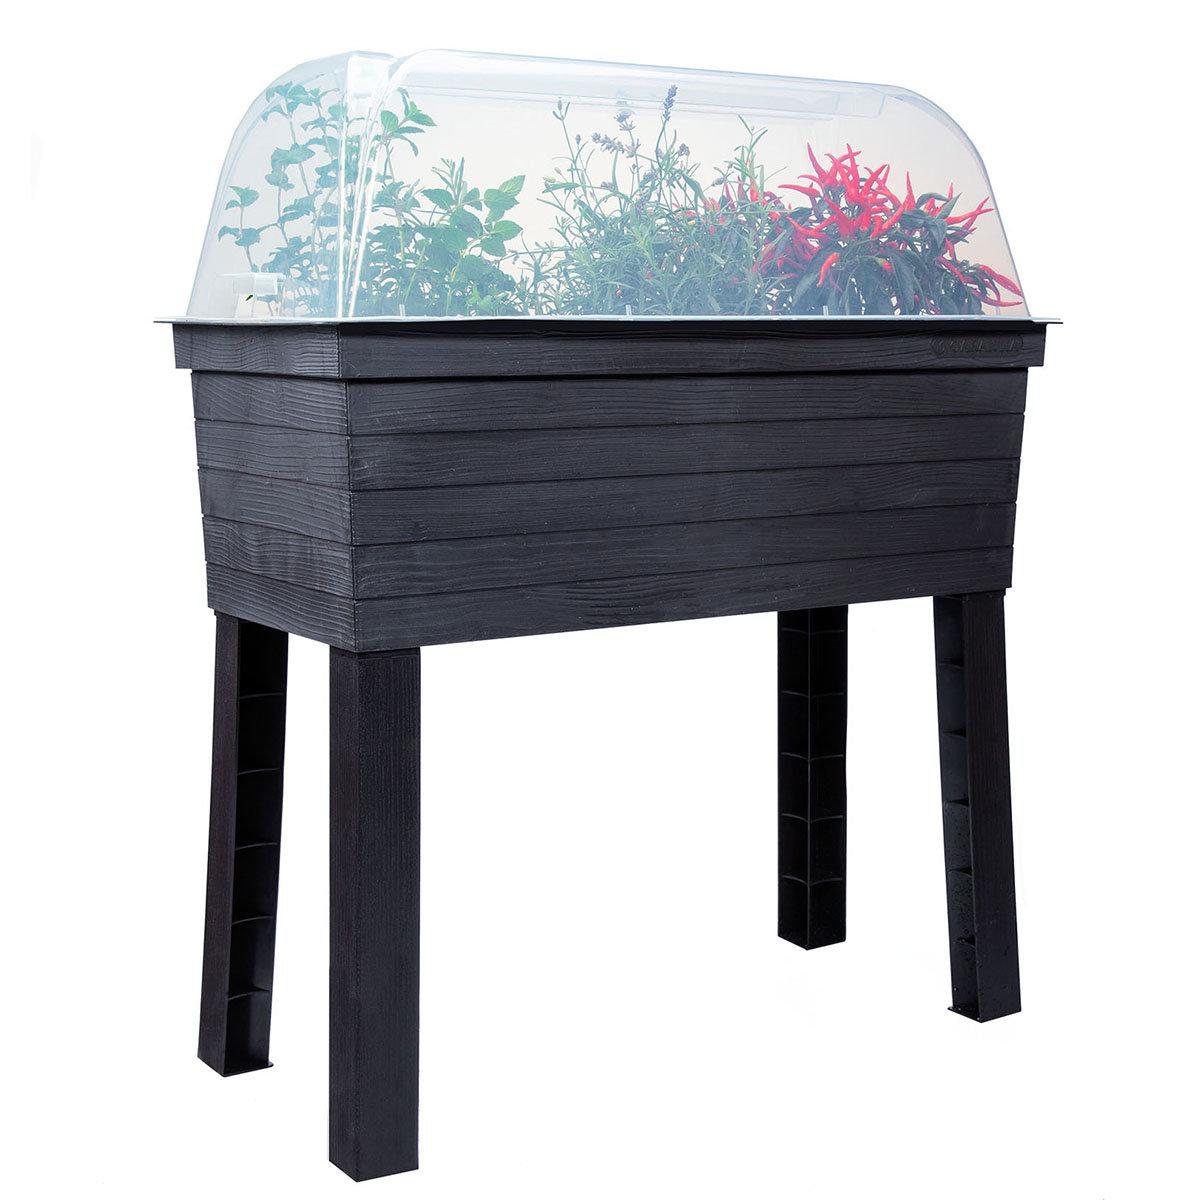 GARANTIA URBAN Balkon-Hochbeet inkl. Anzuchthaube, Kunststoff, schwarz/transparent, 75x37x87 cm | #11